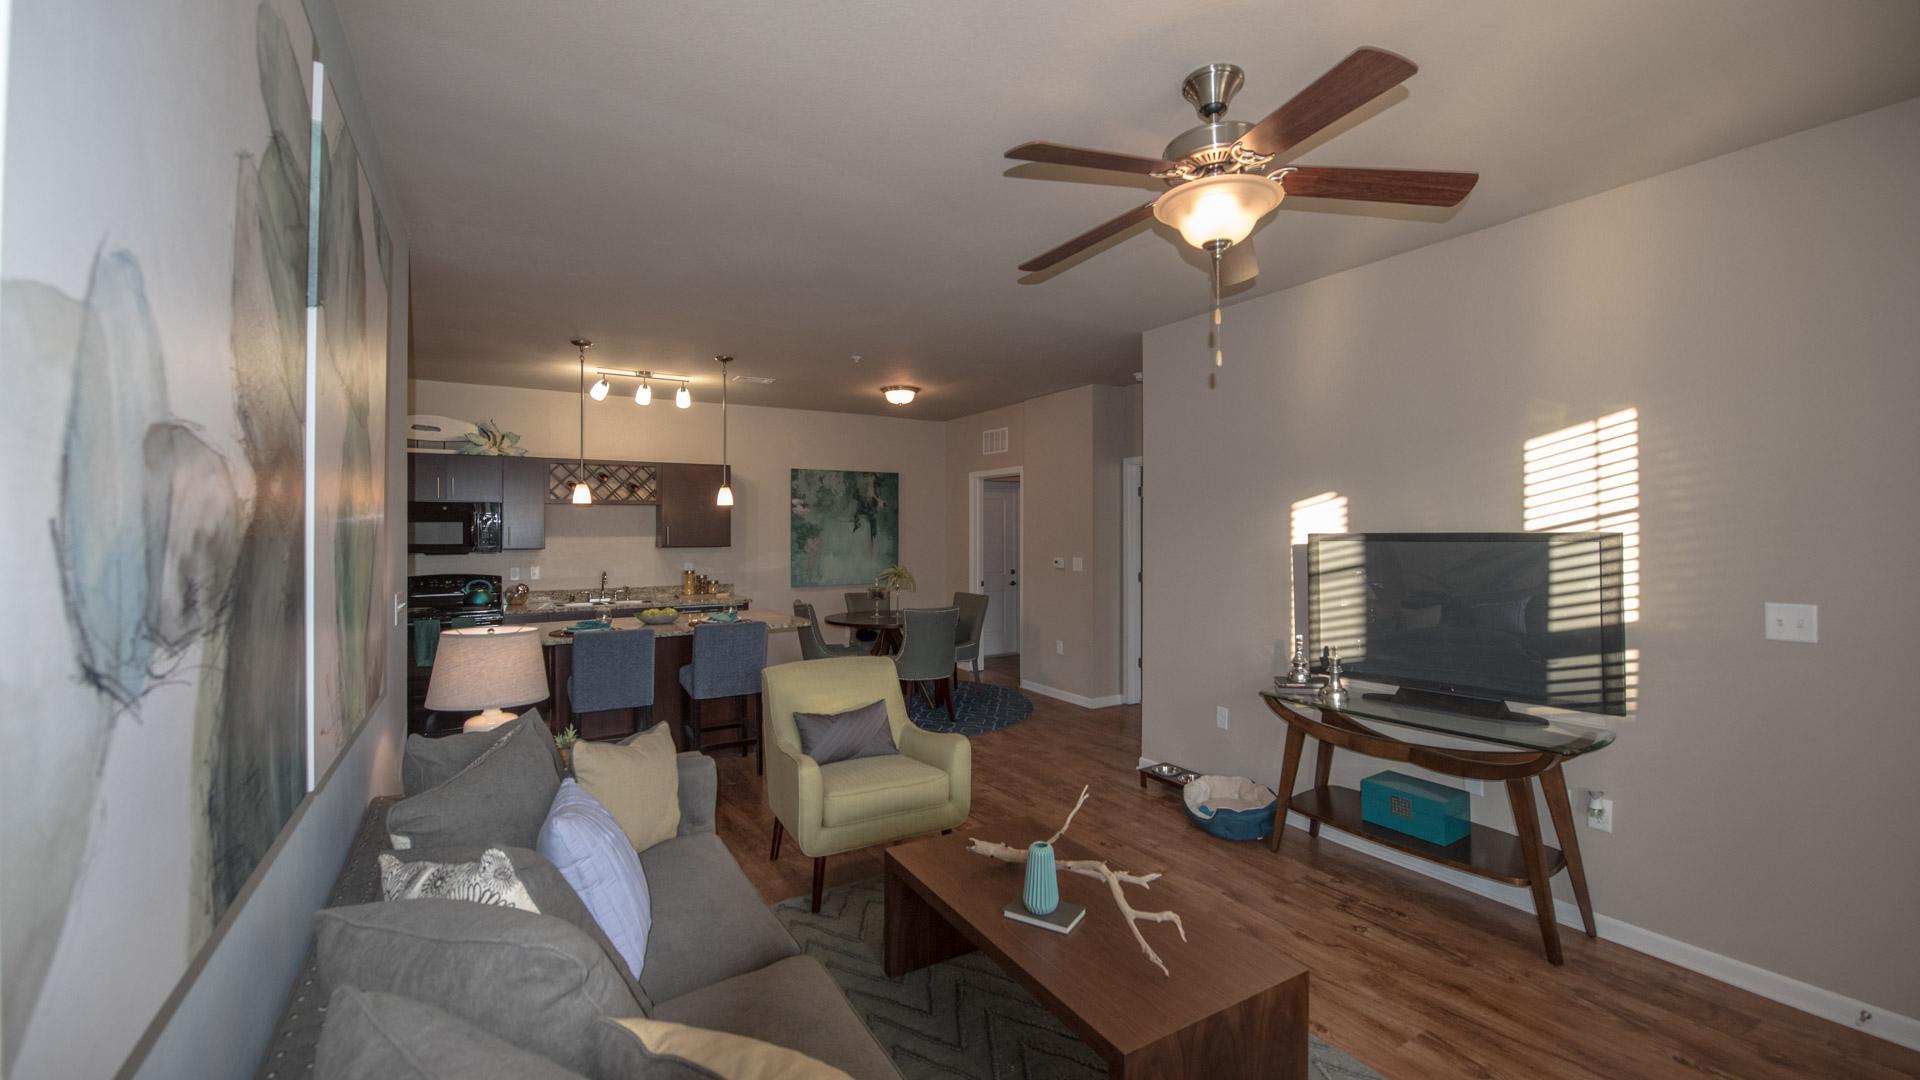 Apartment interior Springs at Kenosha apartments in Kenosha WI